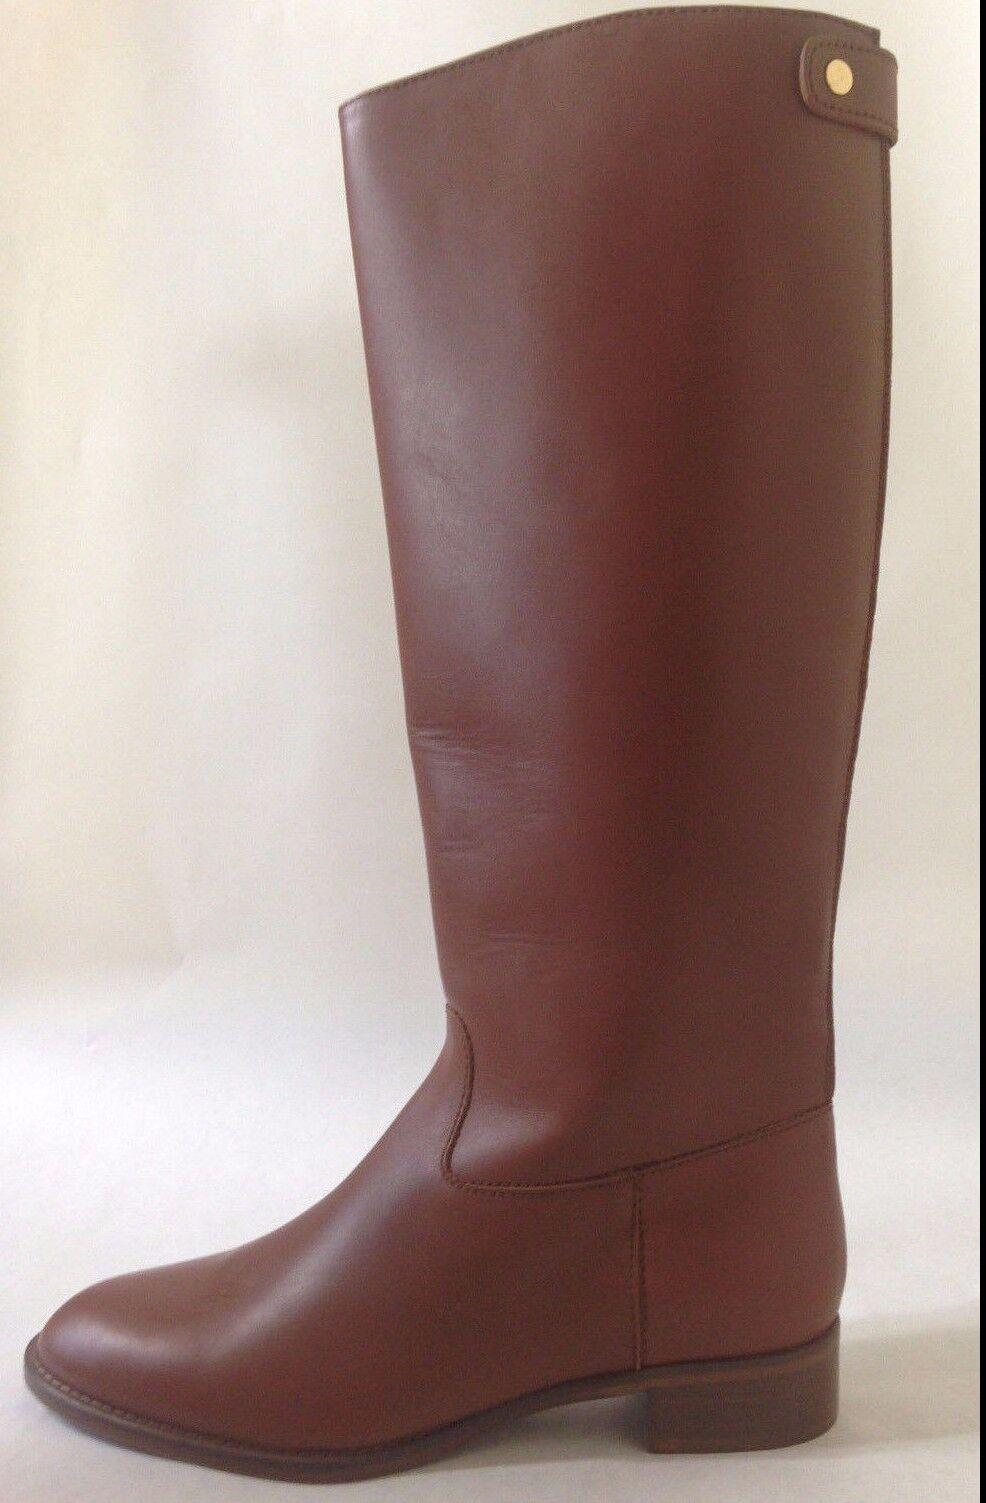 J. Crew Field bottes 02960  328 Kindling tall marron back zip leather sz 5.5